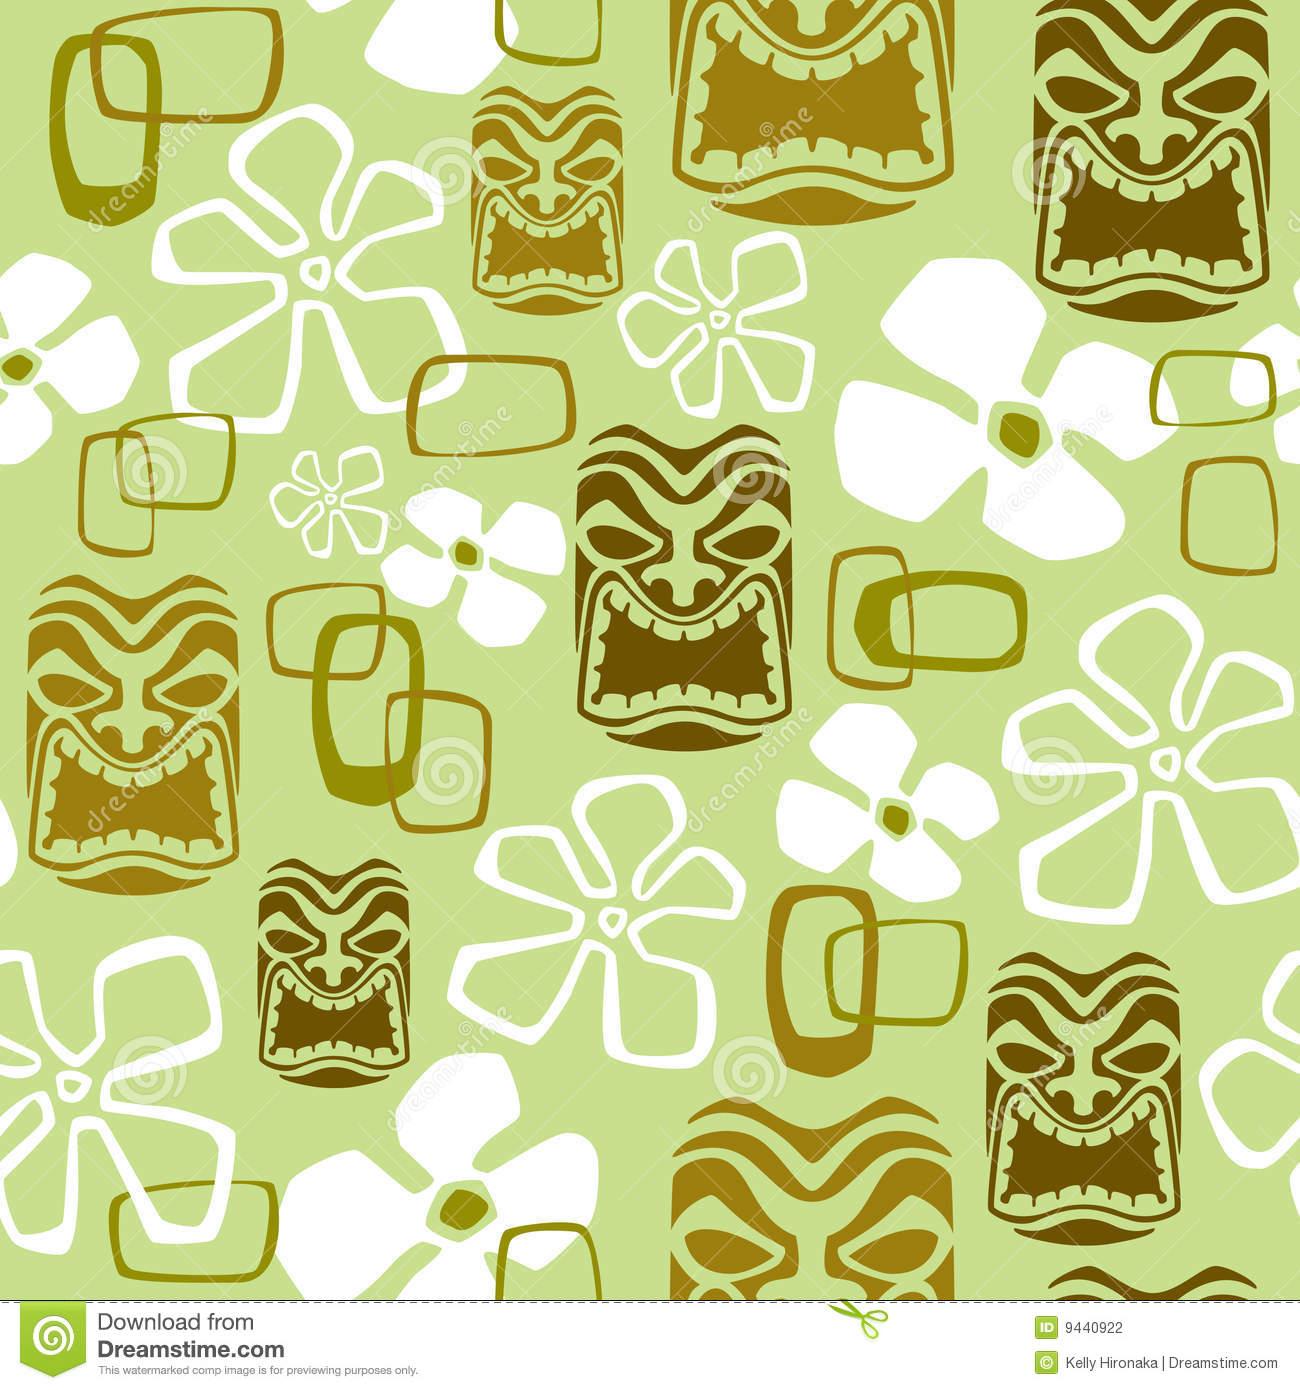 Polynesian Tribal Wallpaper: Hawaiian Tiki Wallpaper